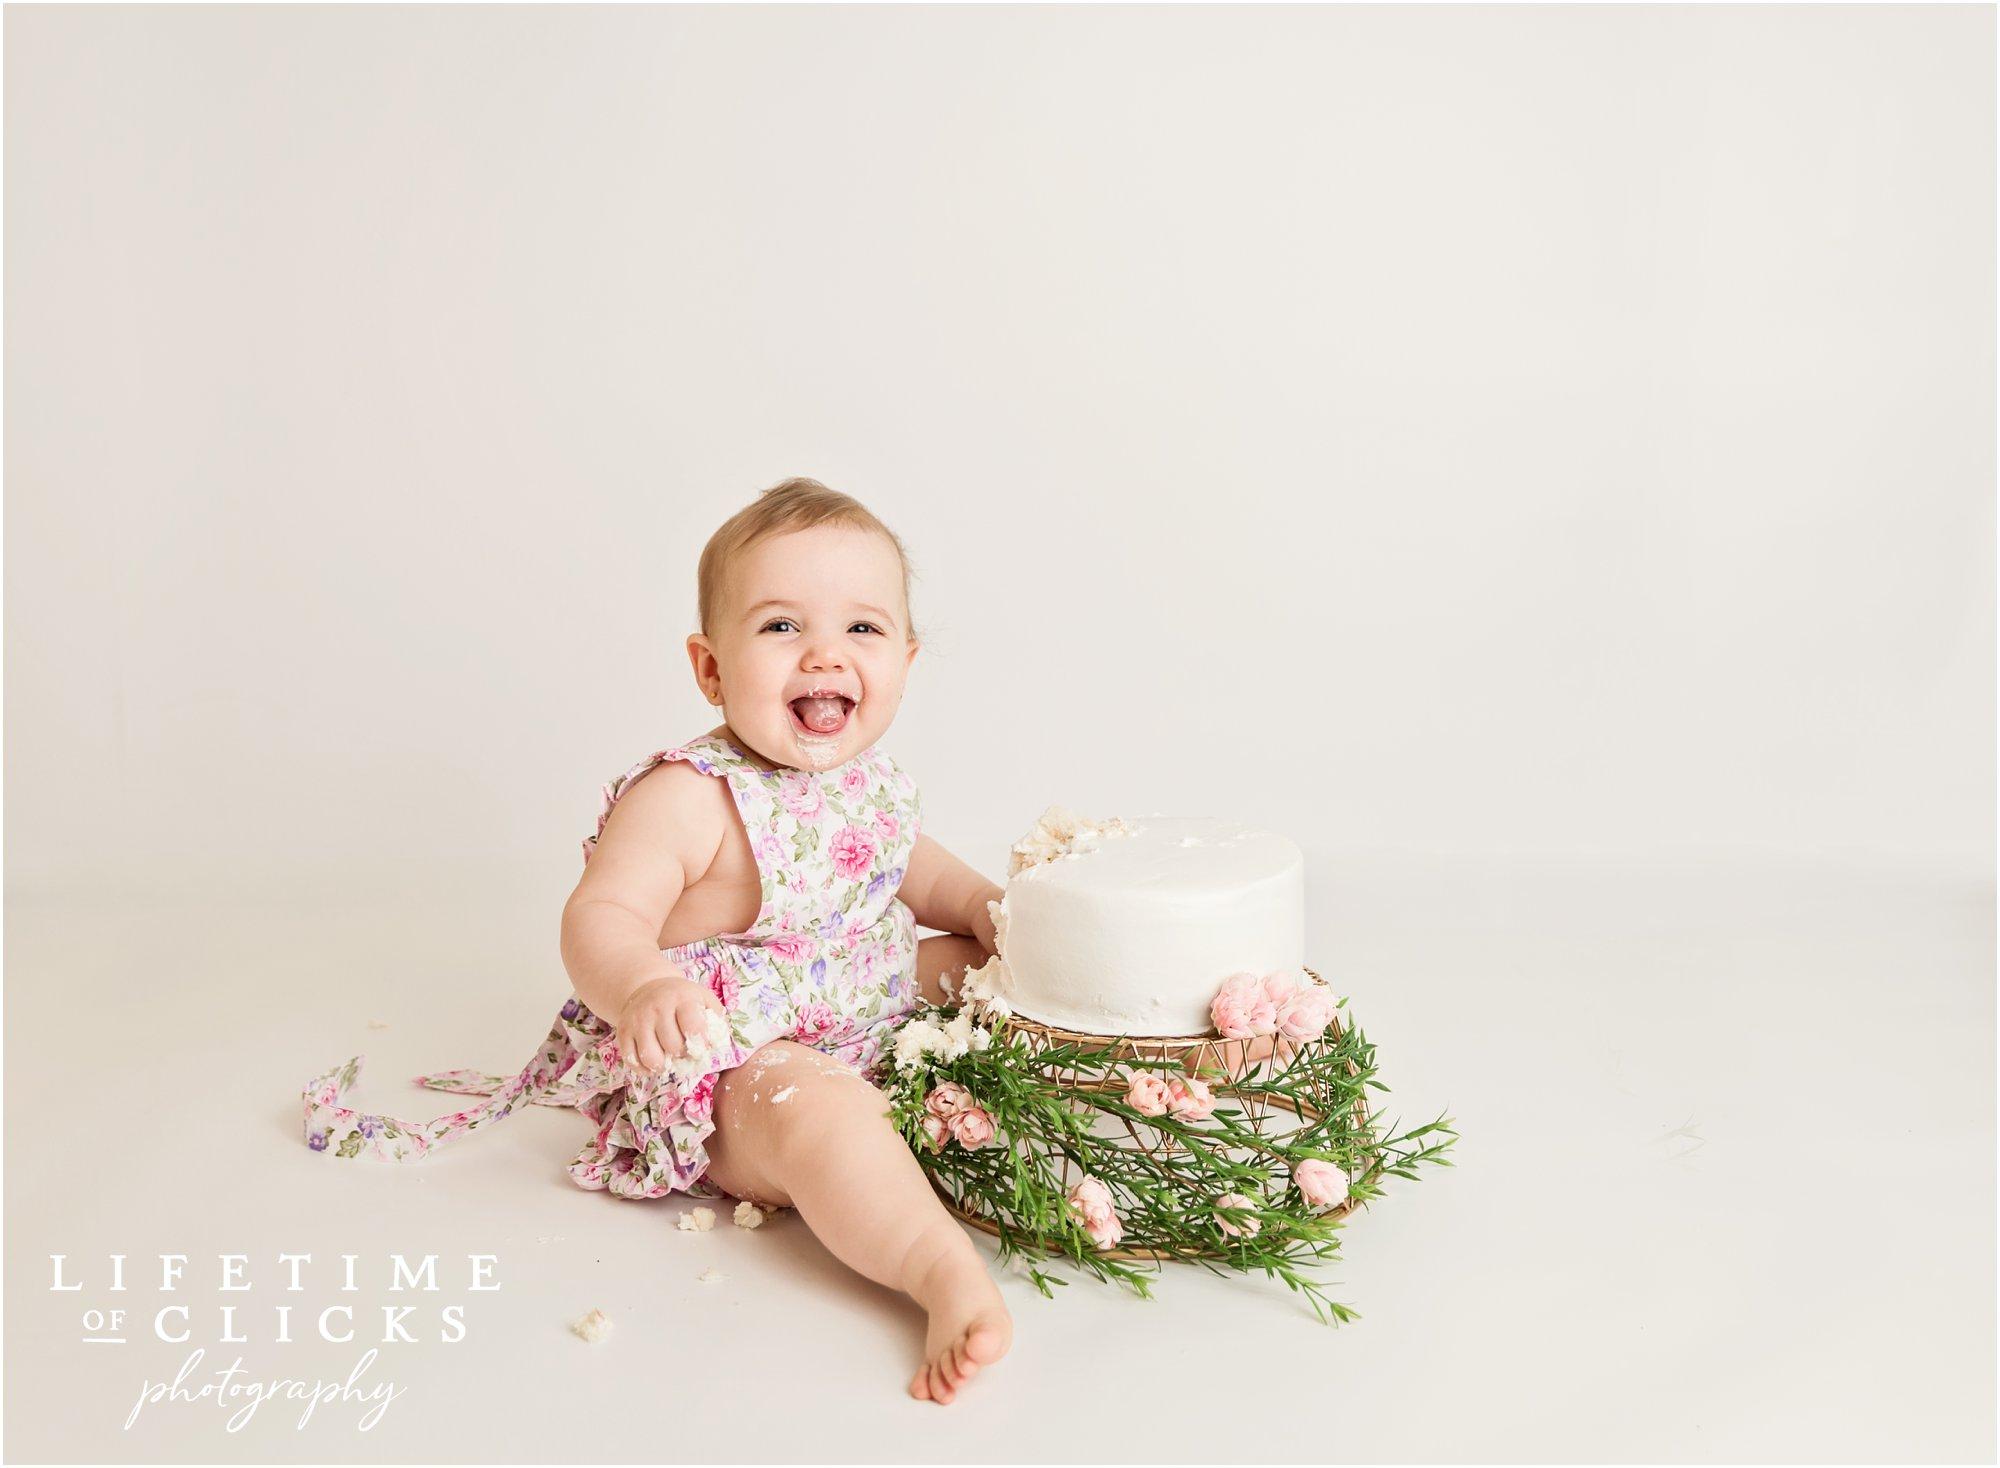 baby girl smiling during cake smash session